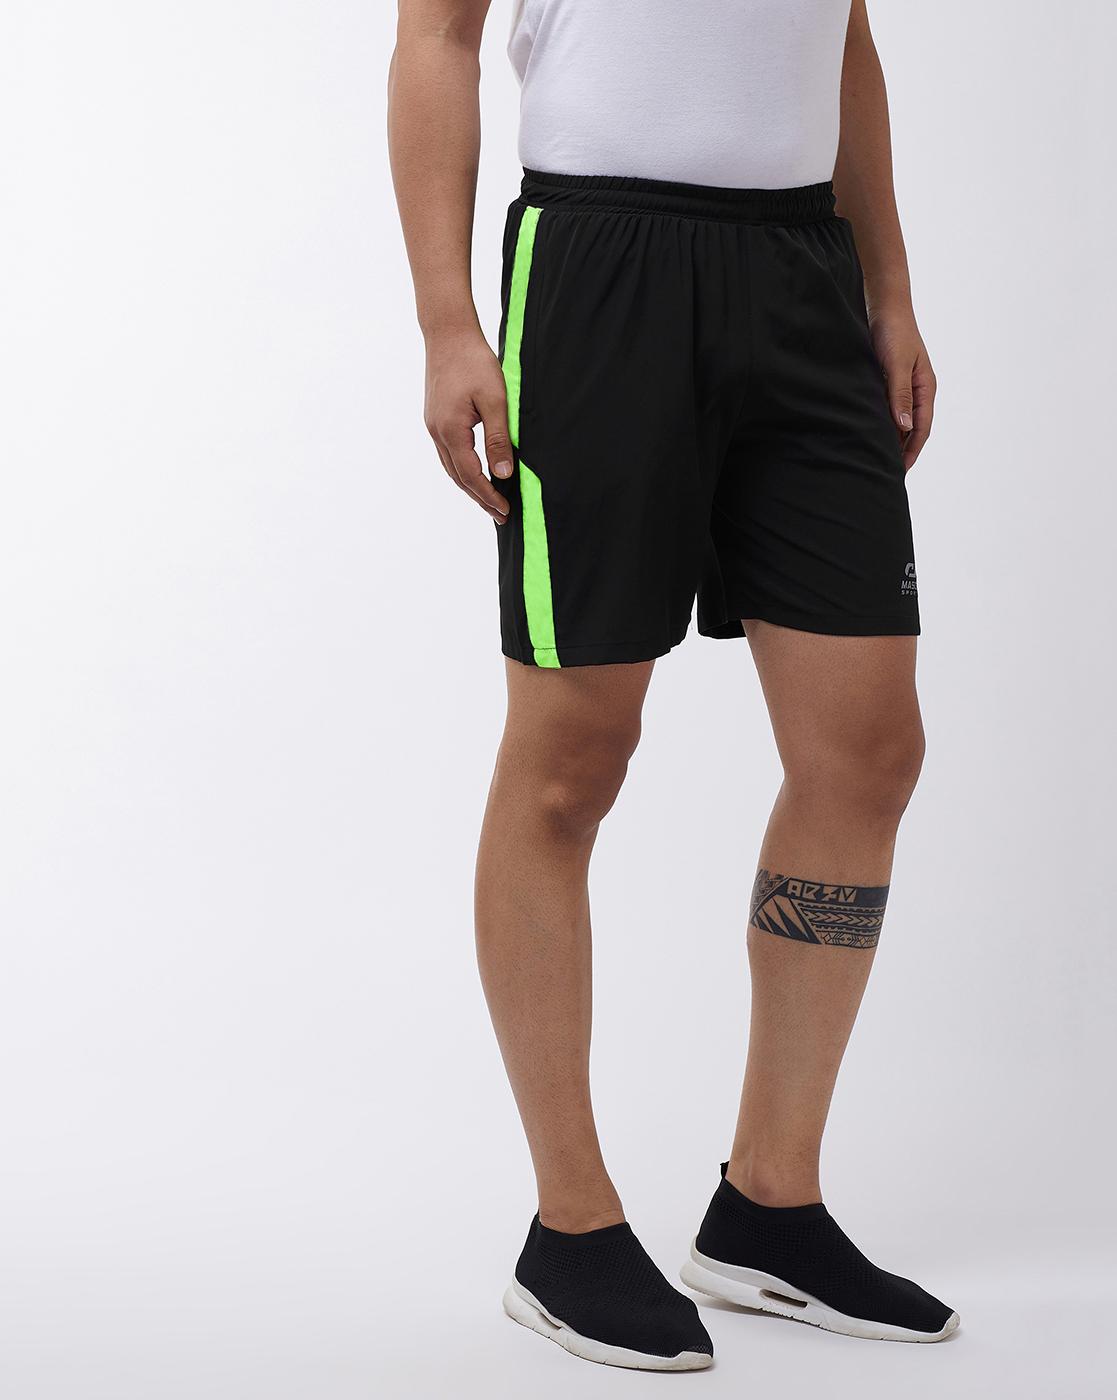 Masch Sports | Masch Sports Men's Black & Fluorescent Neon Gym & Activewear Shorts